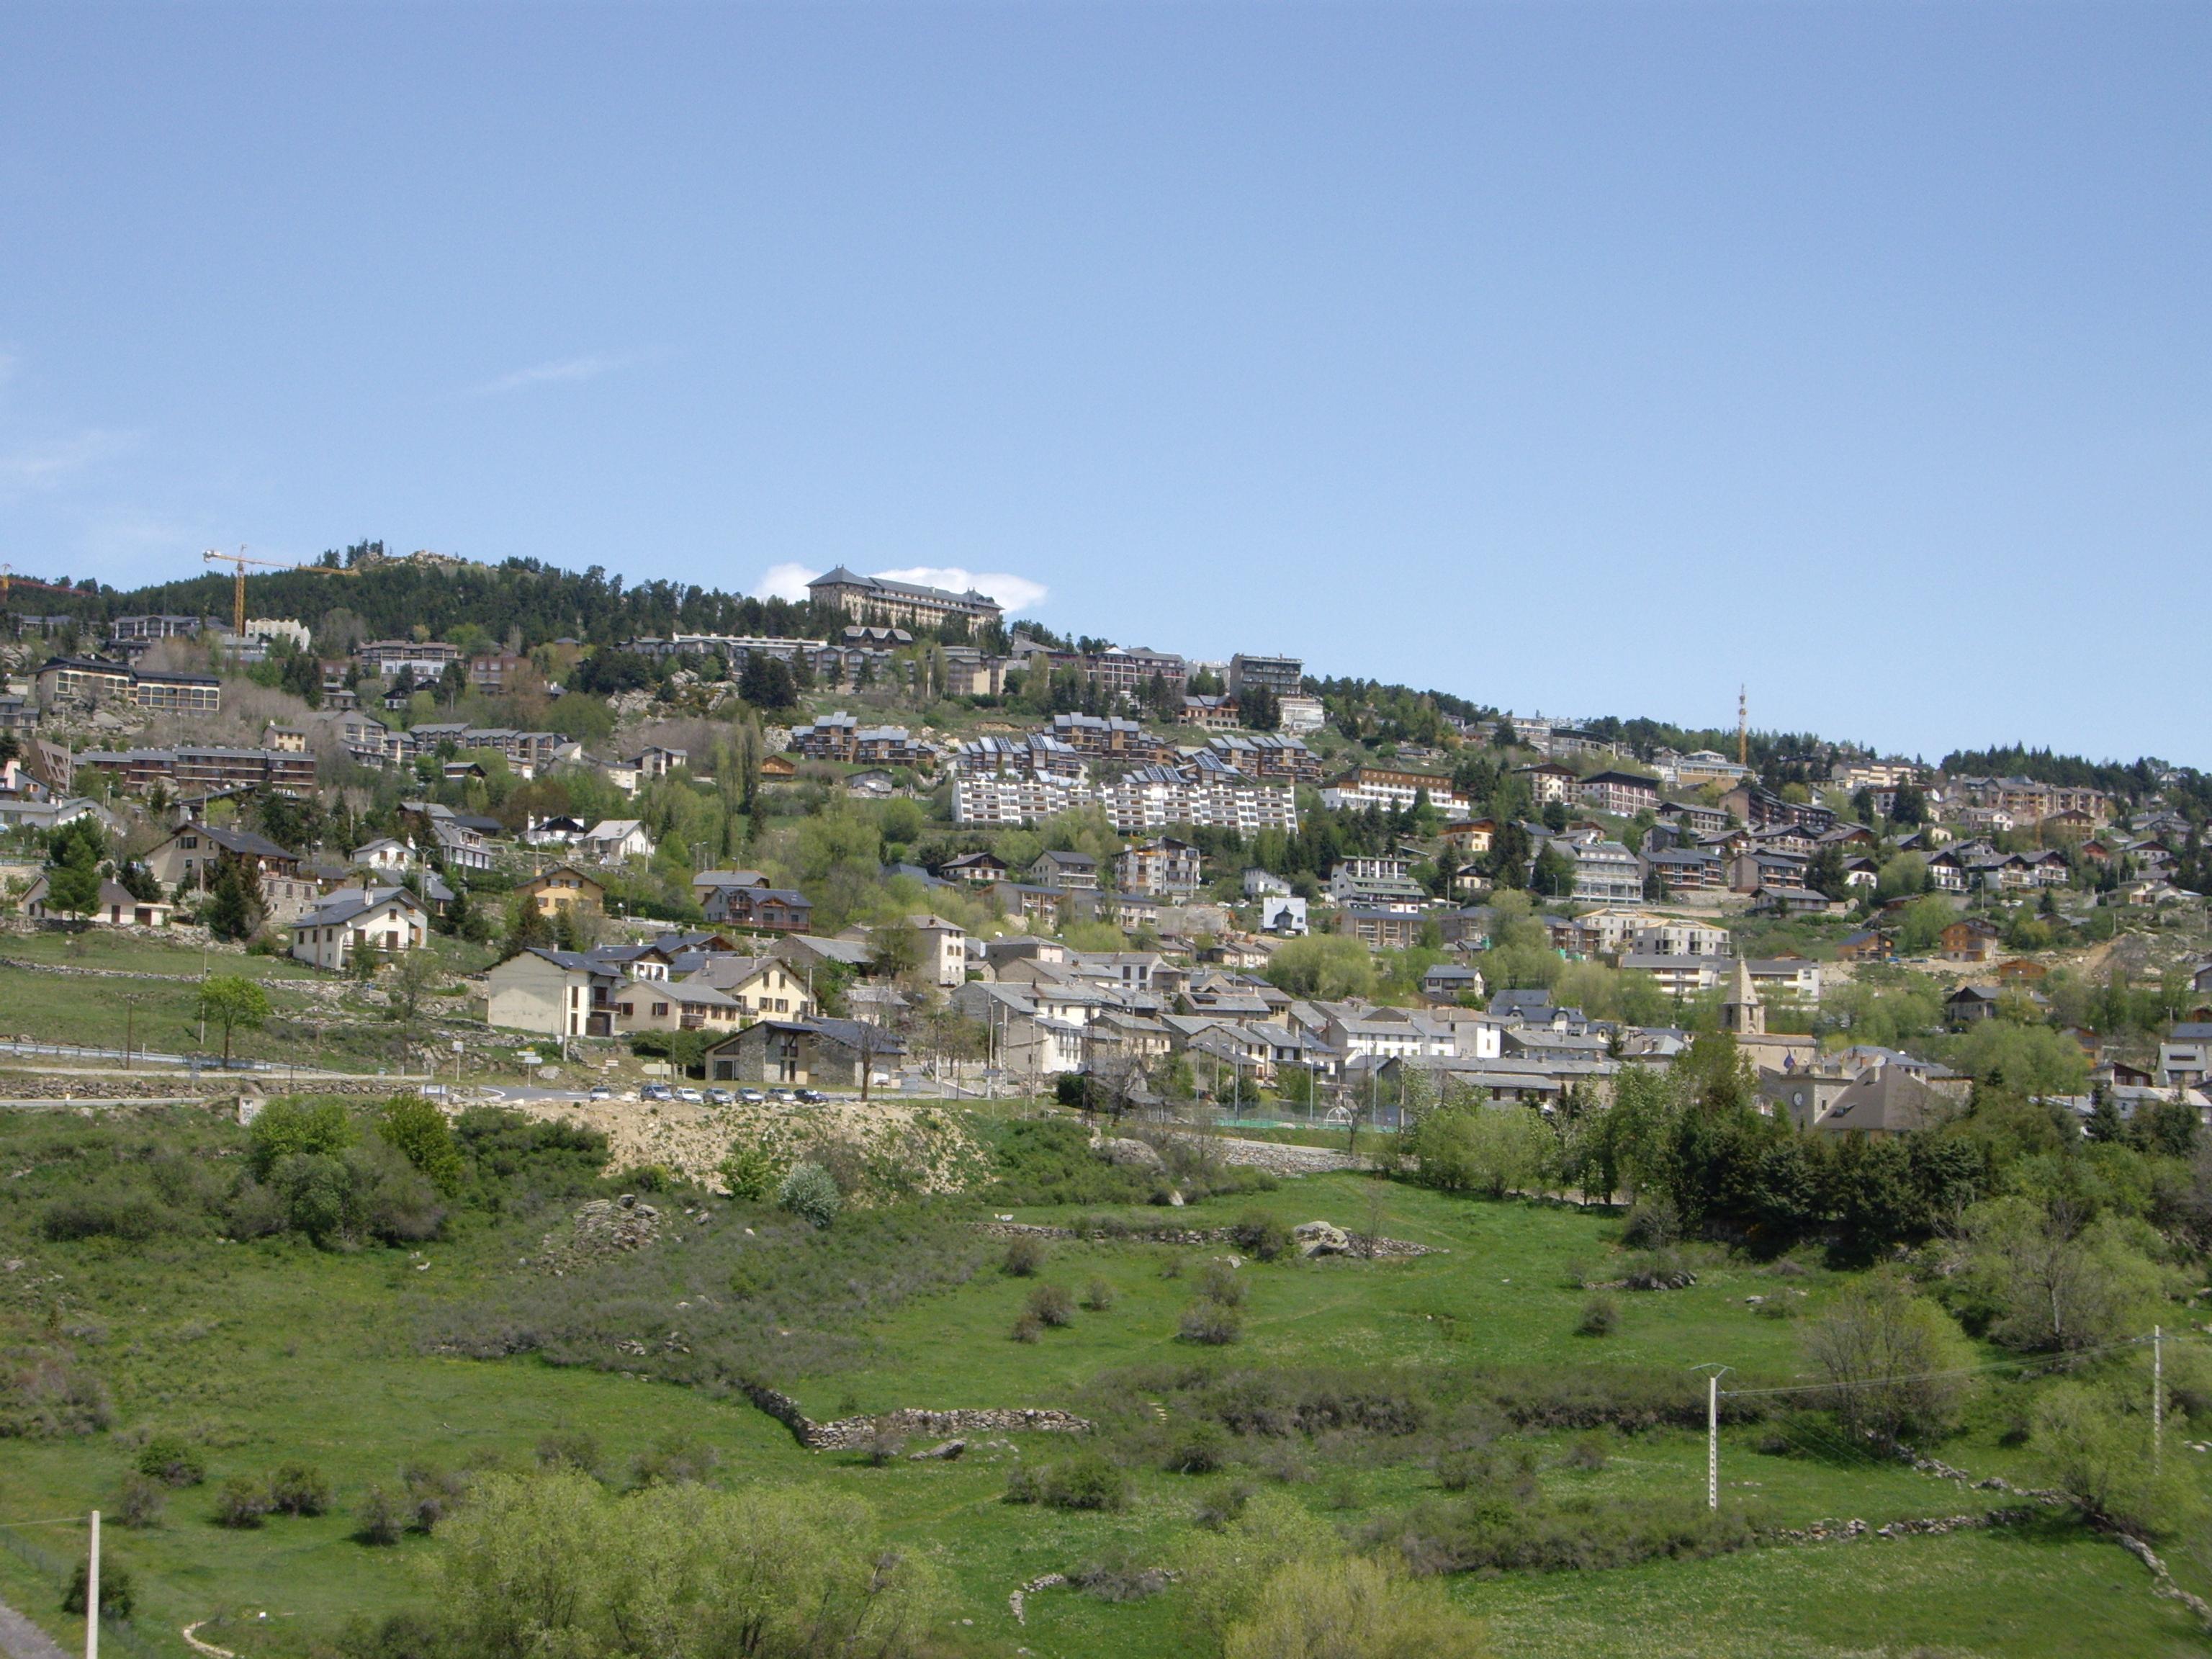 Font-Romeu-Odeillo-Via France  city photo : Fitxer:Font Romeu Odeillo Via 66 Viquipèdia, l'enciclopèdia ...